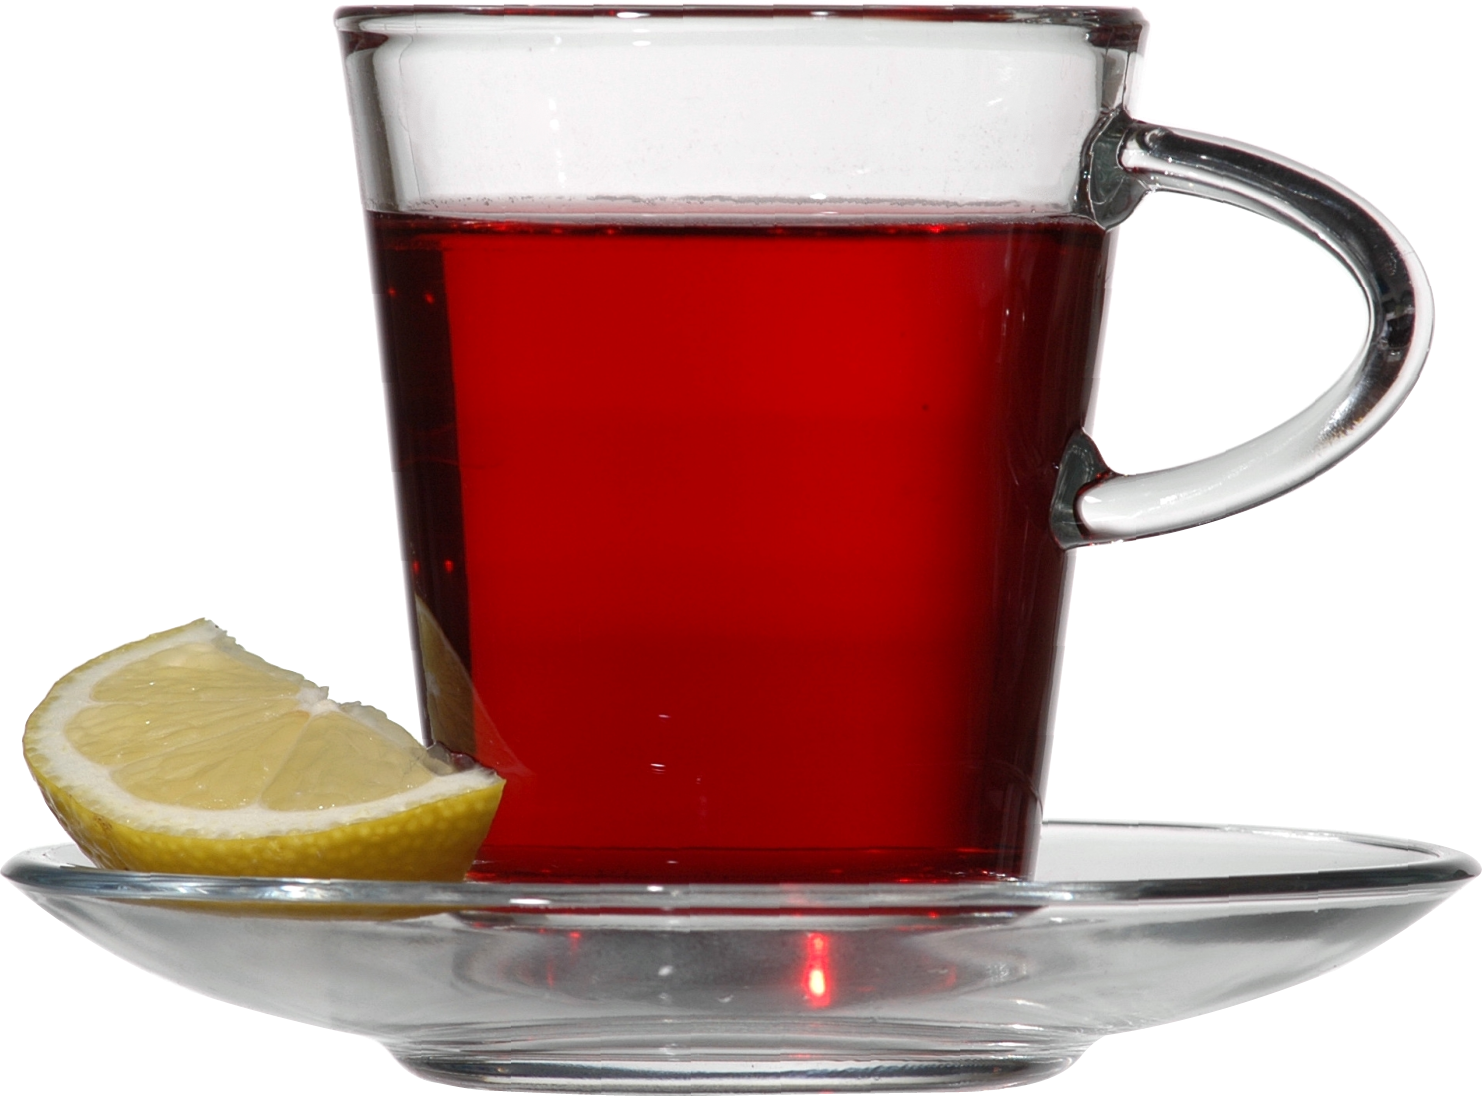 Pin By Narr 8 On T U Red Tea Tea Tea Cups